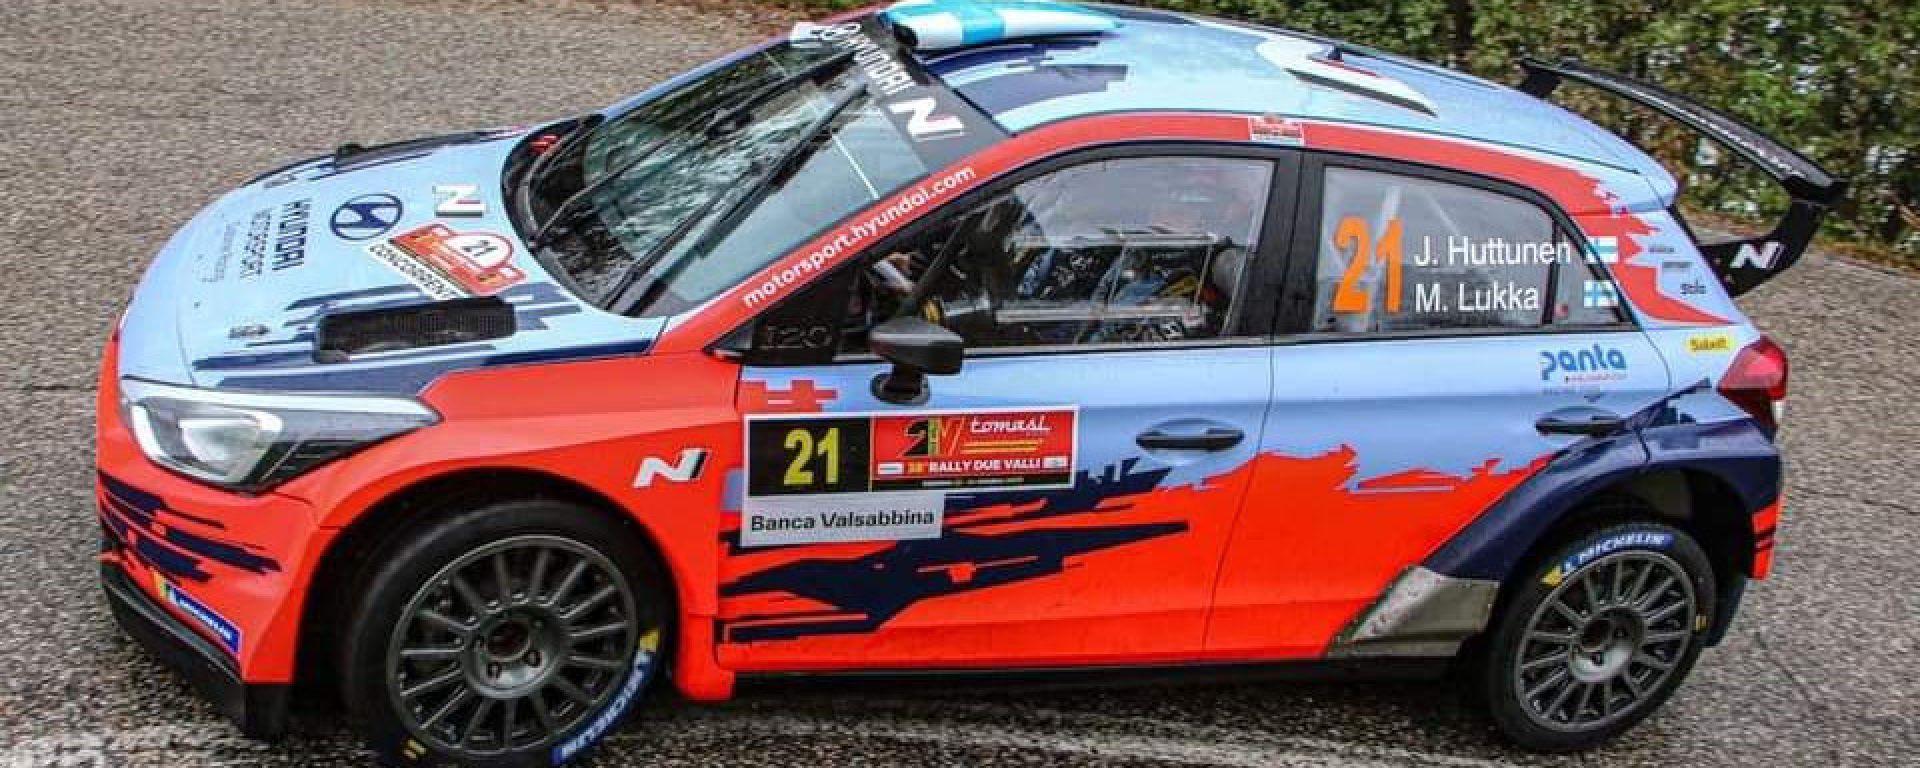 CIR, Rally Due Valli 2020: Jari Huttunen (Hyundai)